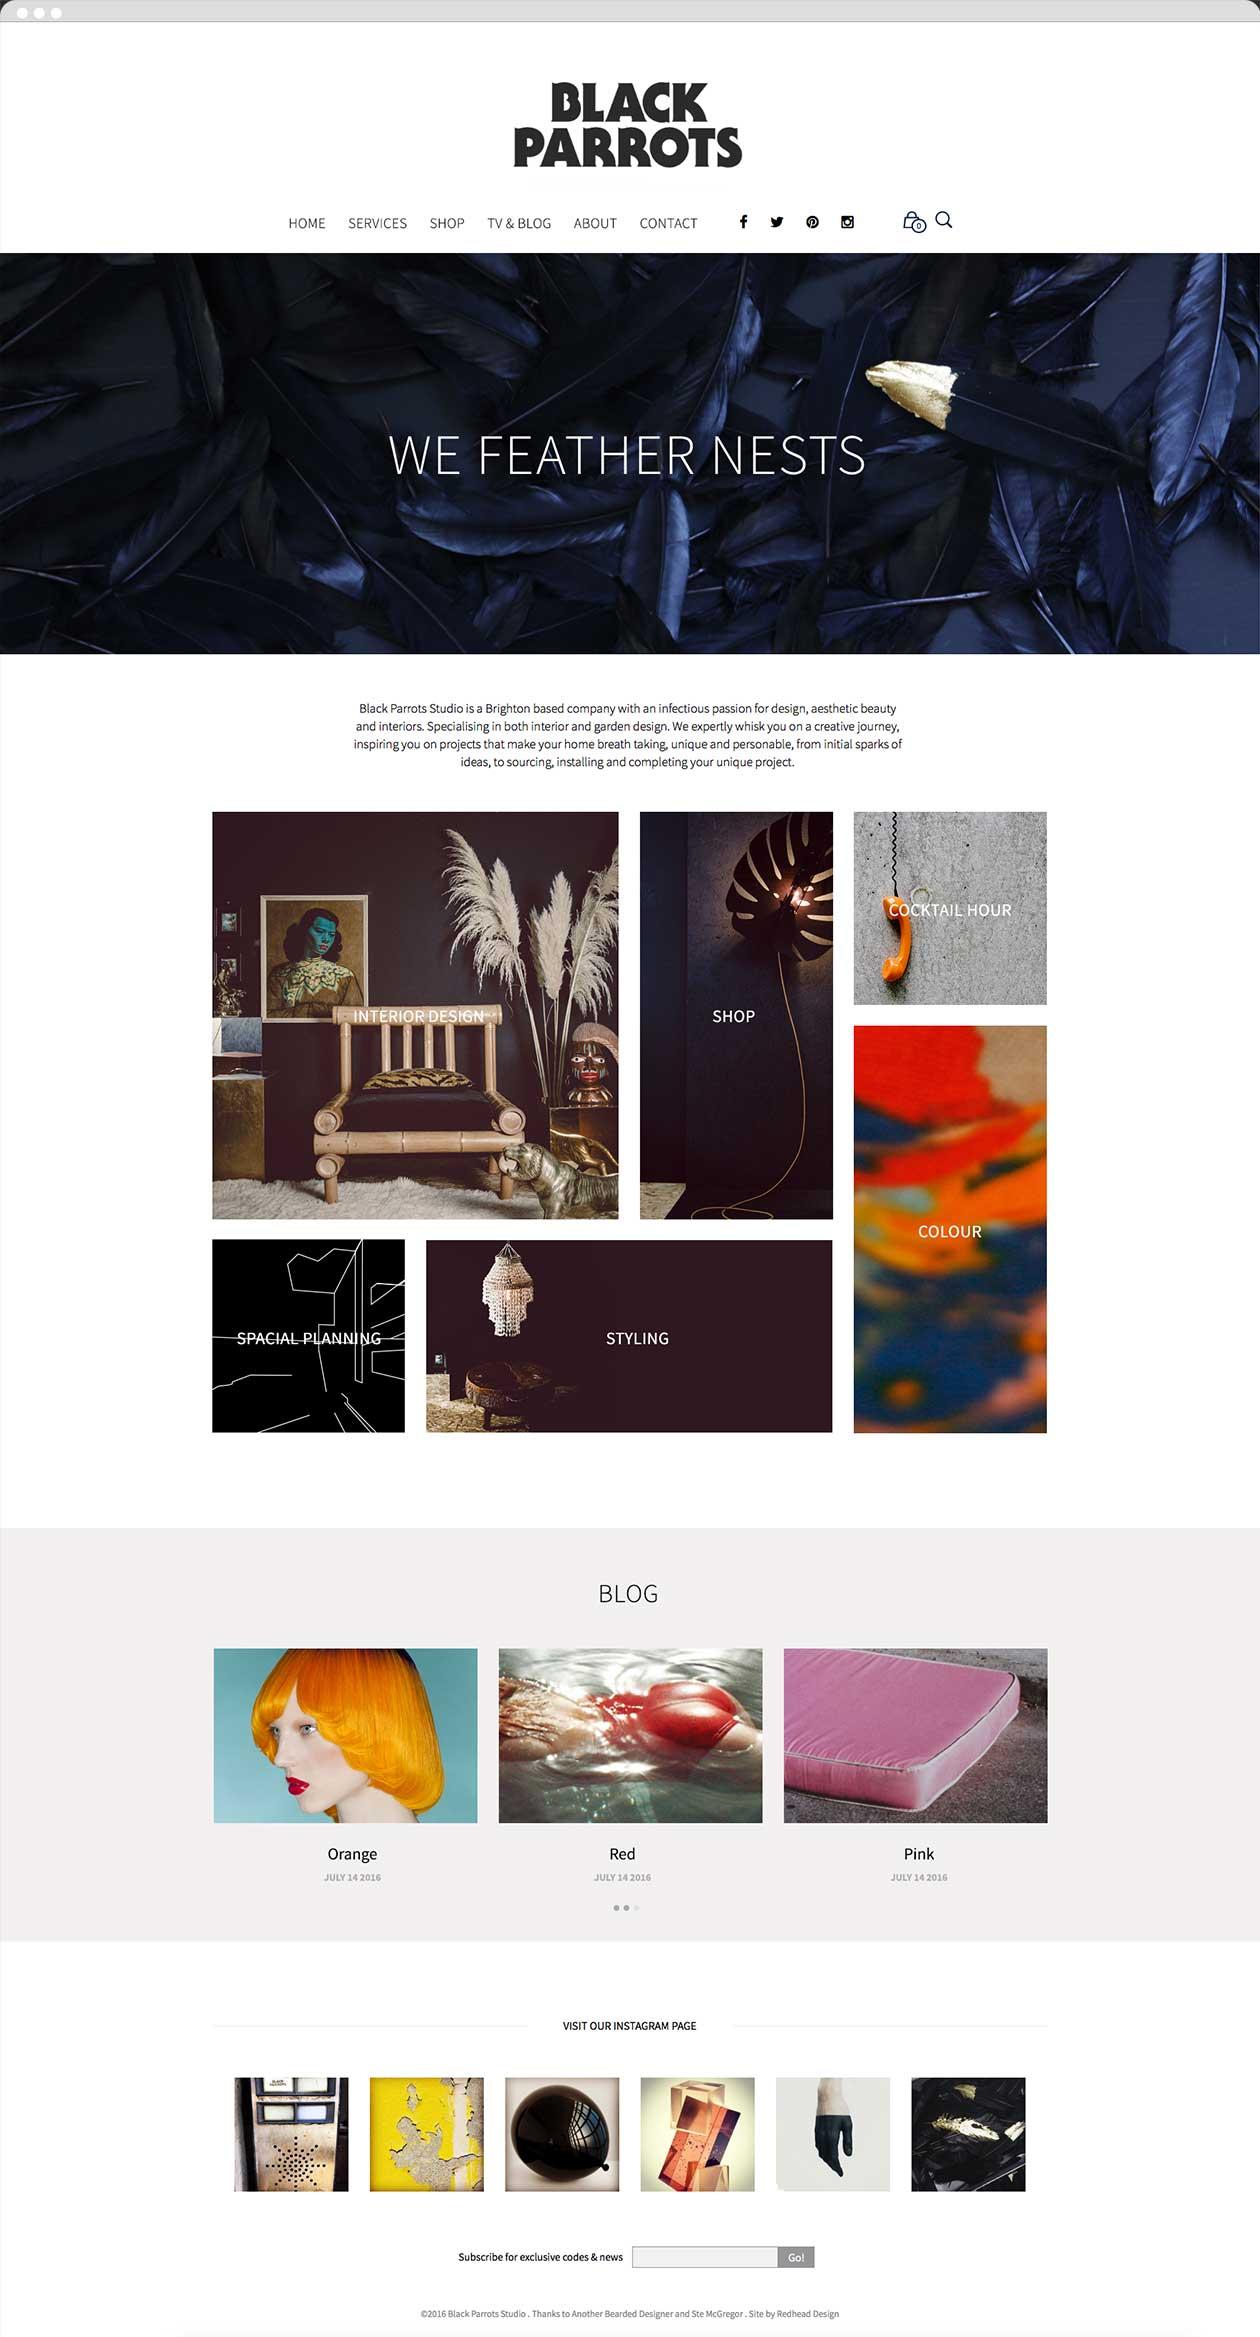 Black Parrots home page website design screen